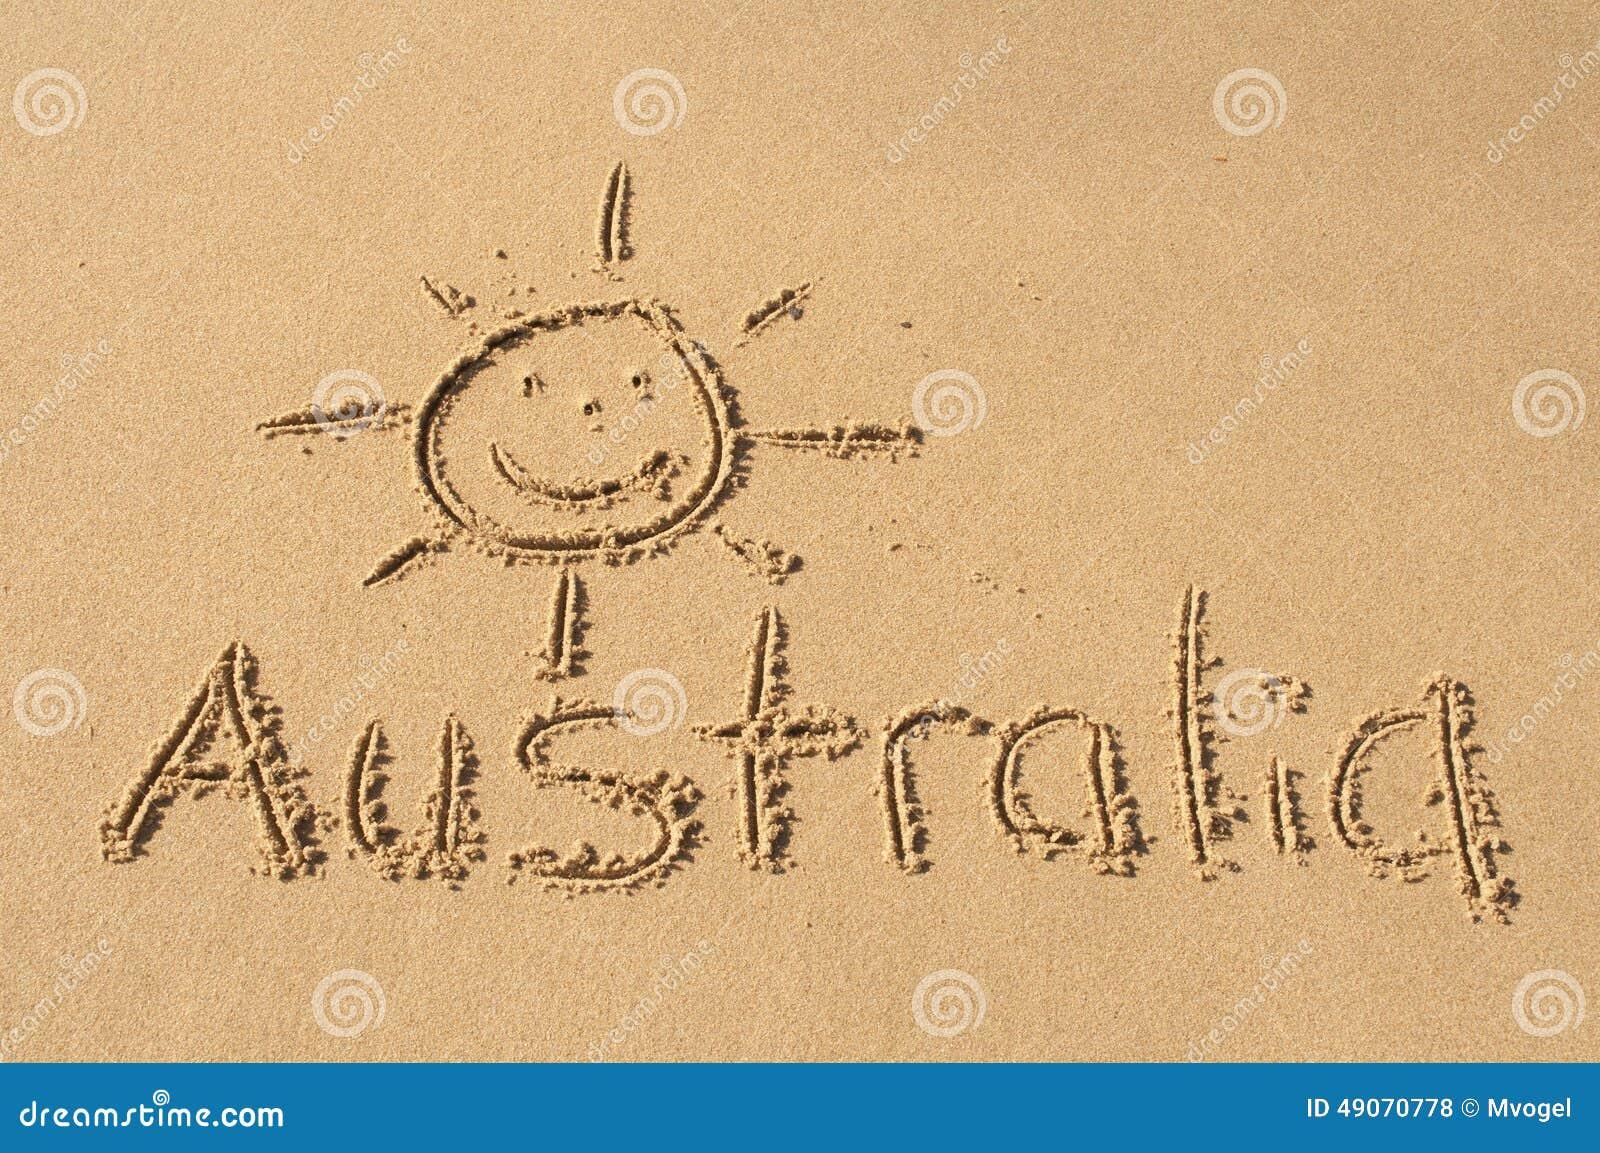 Australia in the Sand